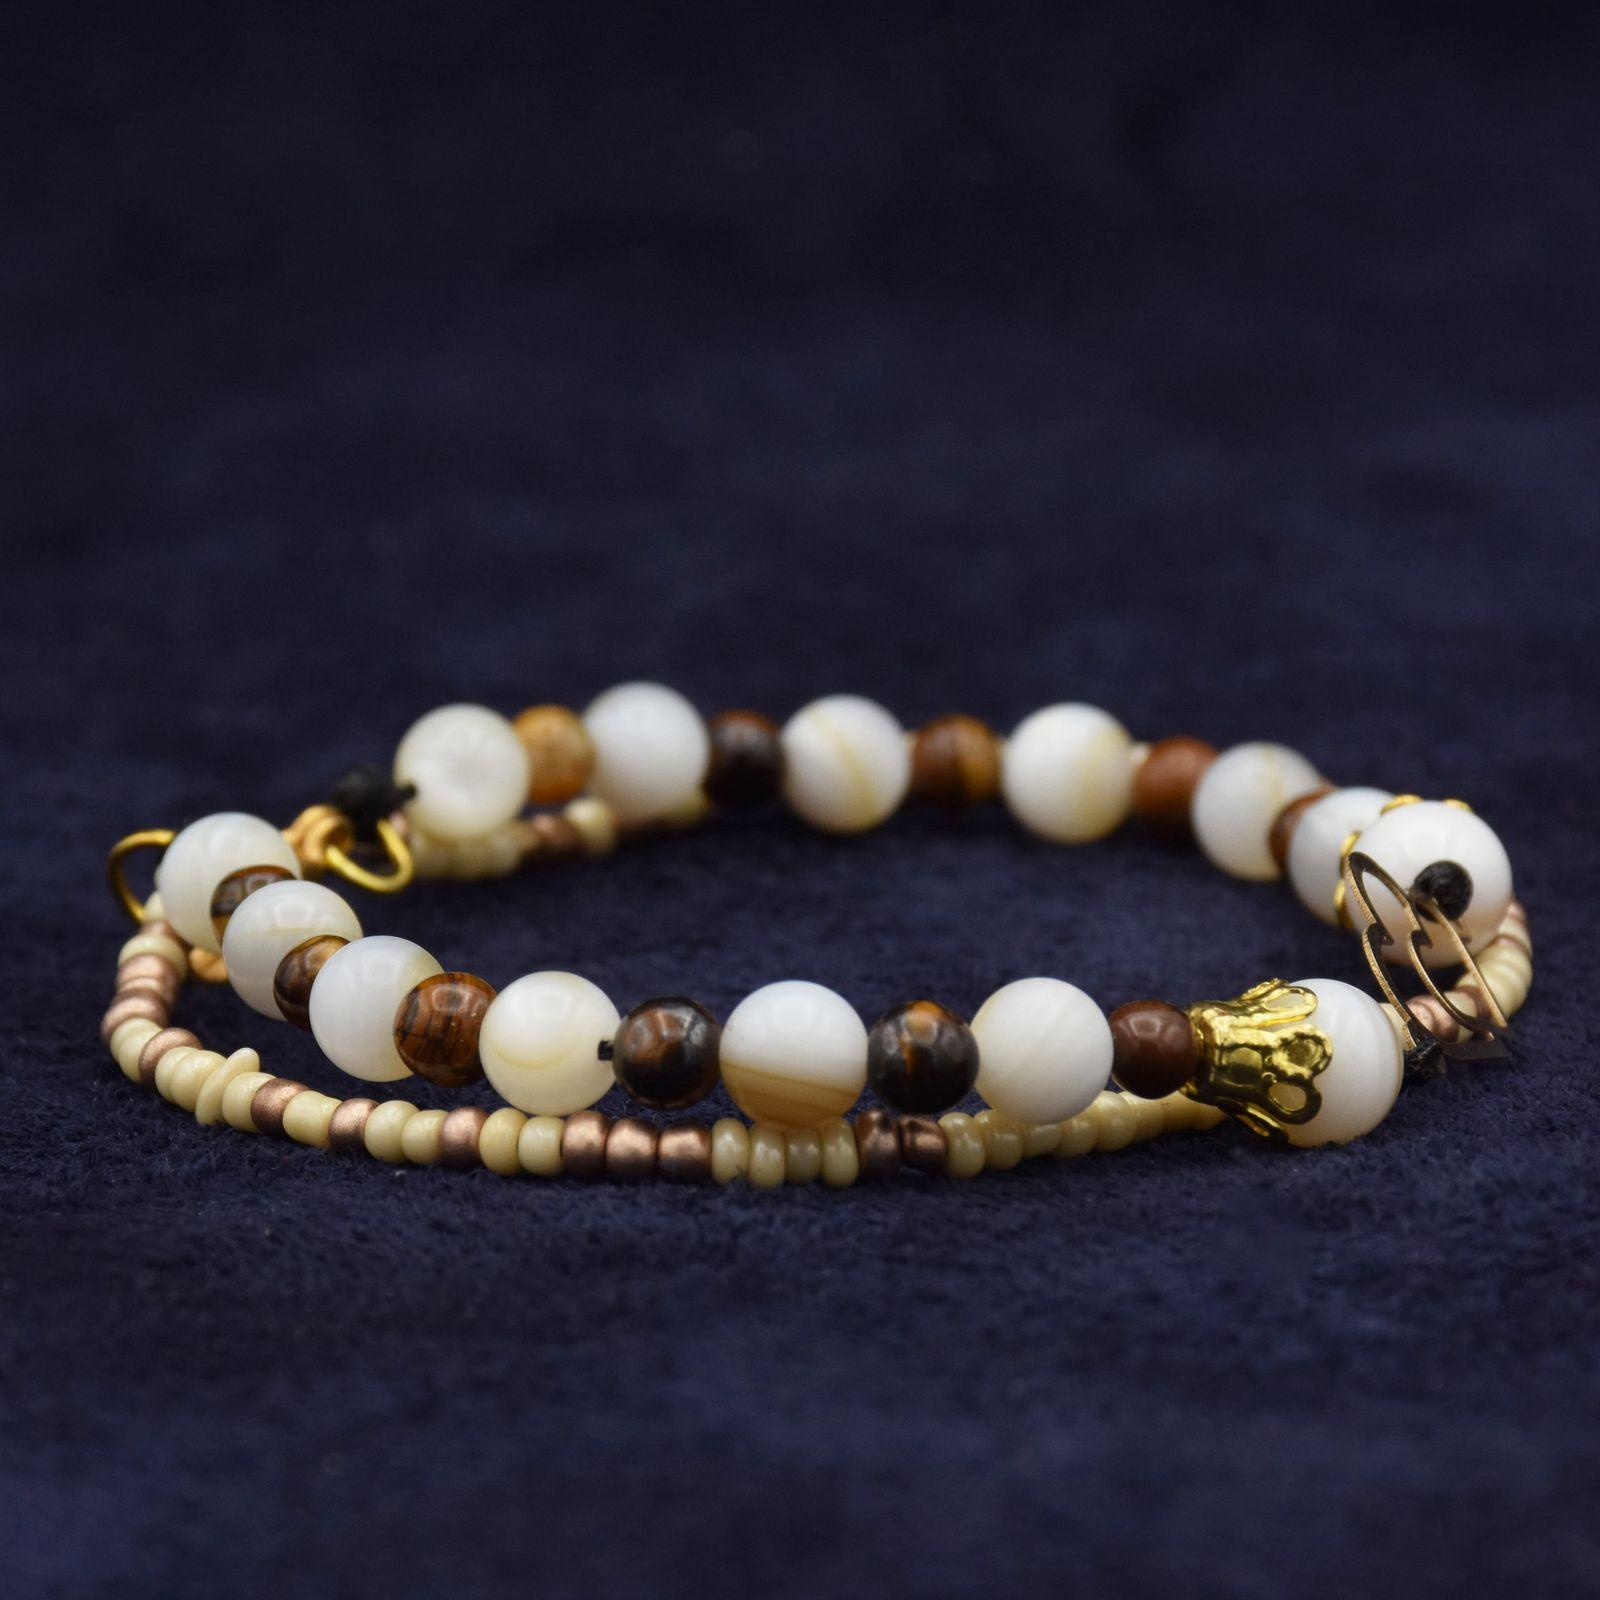 دستبند طلا 18 عیار زنانه آمانژ طرح قلب کد 972D8905 -  - 3